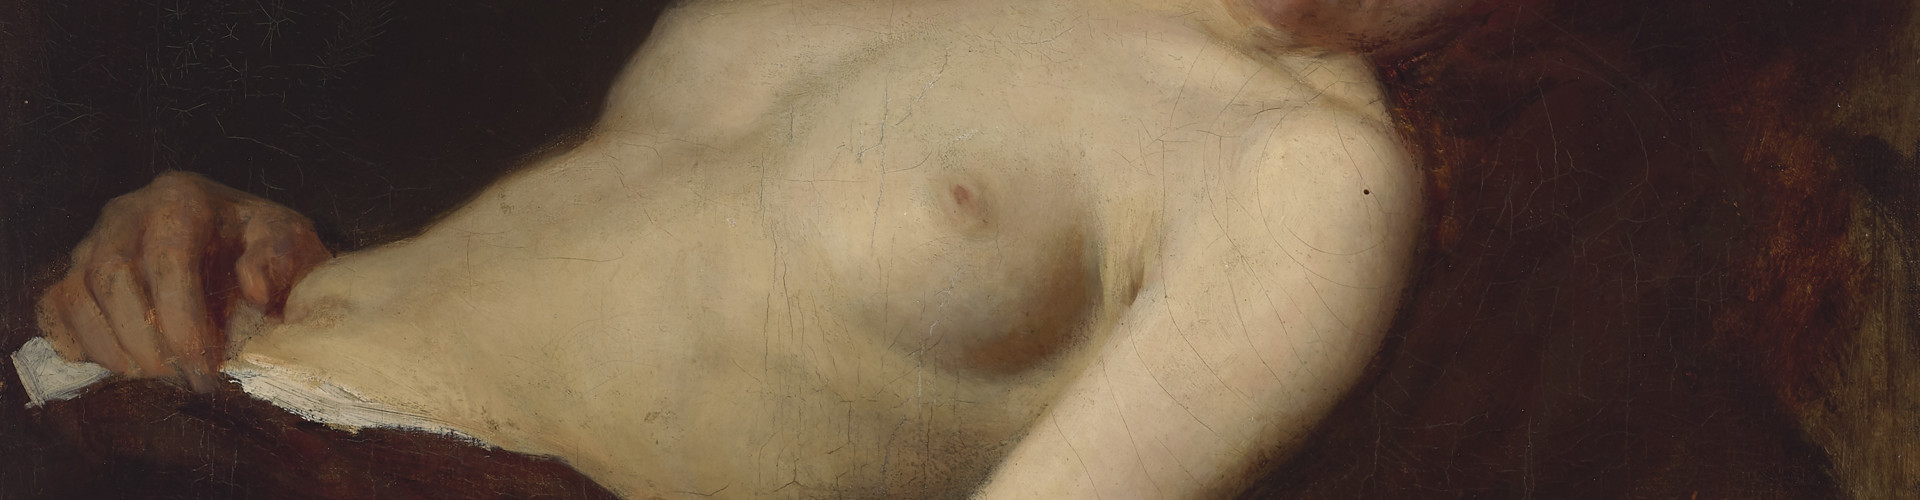 Franz von Defregger, Resting female semi-nude, c. 1890, oil on canvas, 48 x 52.5 cm, private collection © Tiroler Landesmuseen